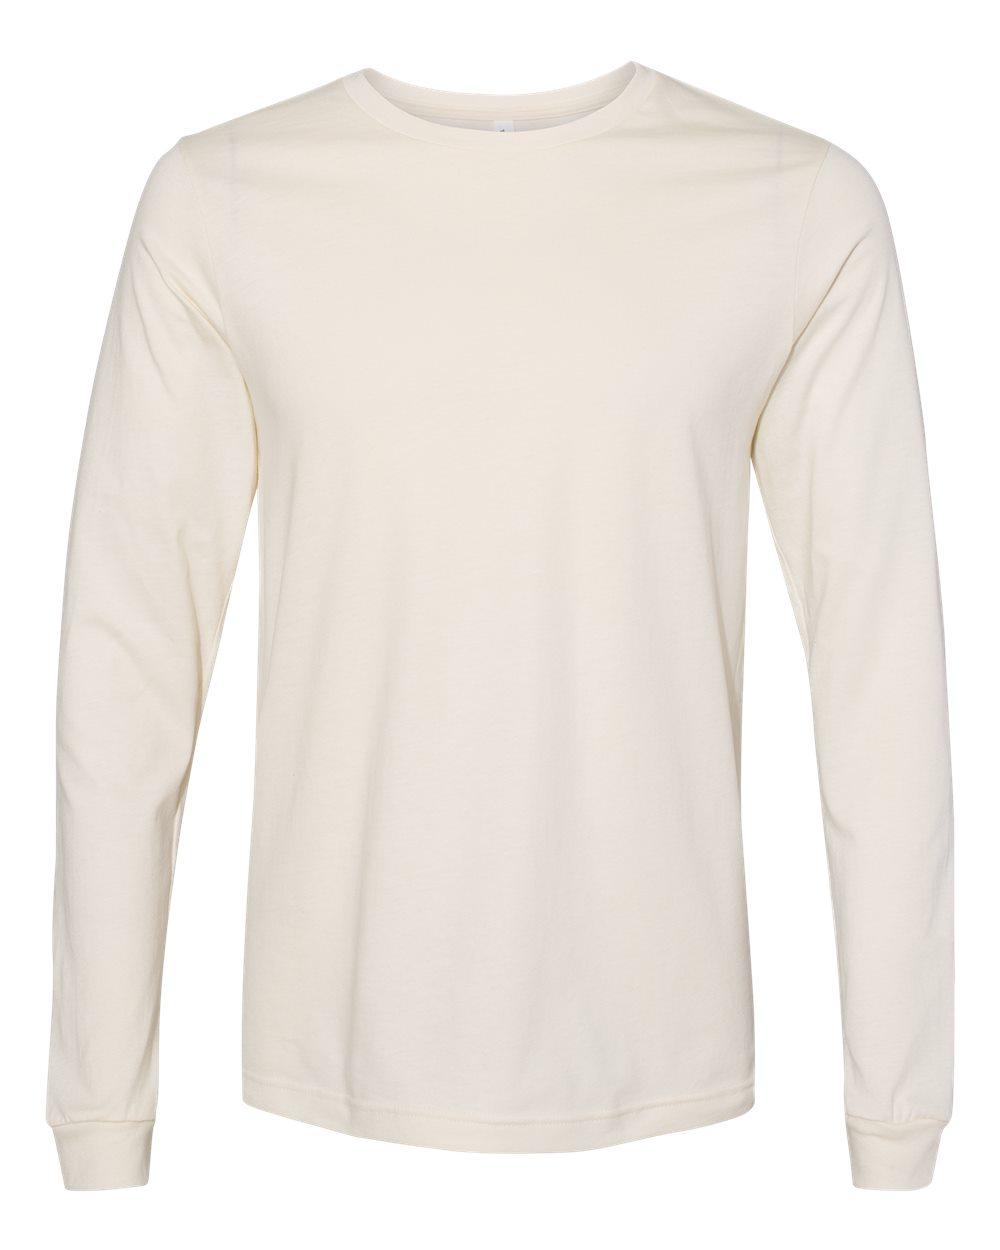 Bella-Canvas-Mens-Blank-Top-Long-Sleeve-Jersey-Tee-T-Shirt-3501-up-to-3XL thumbnail 85